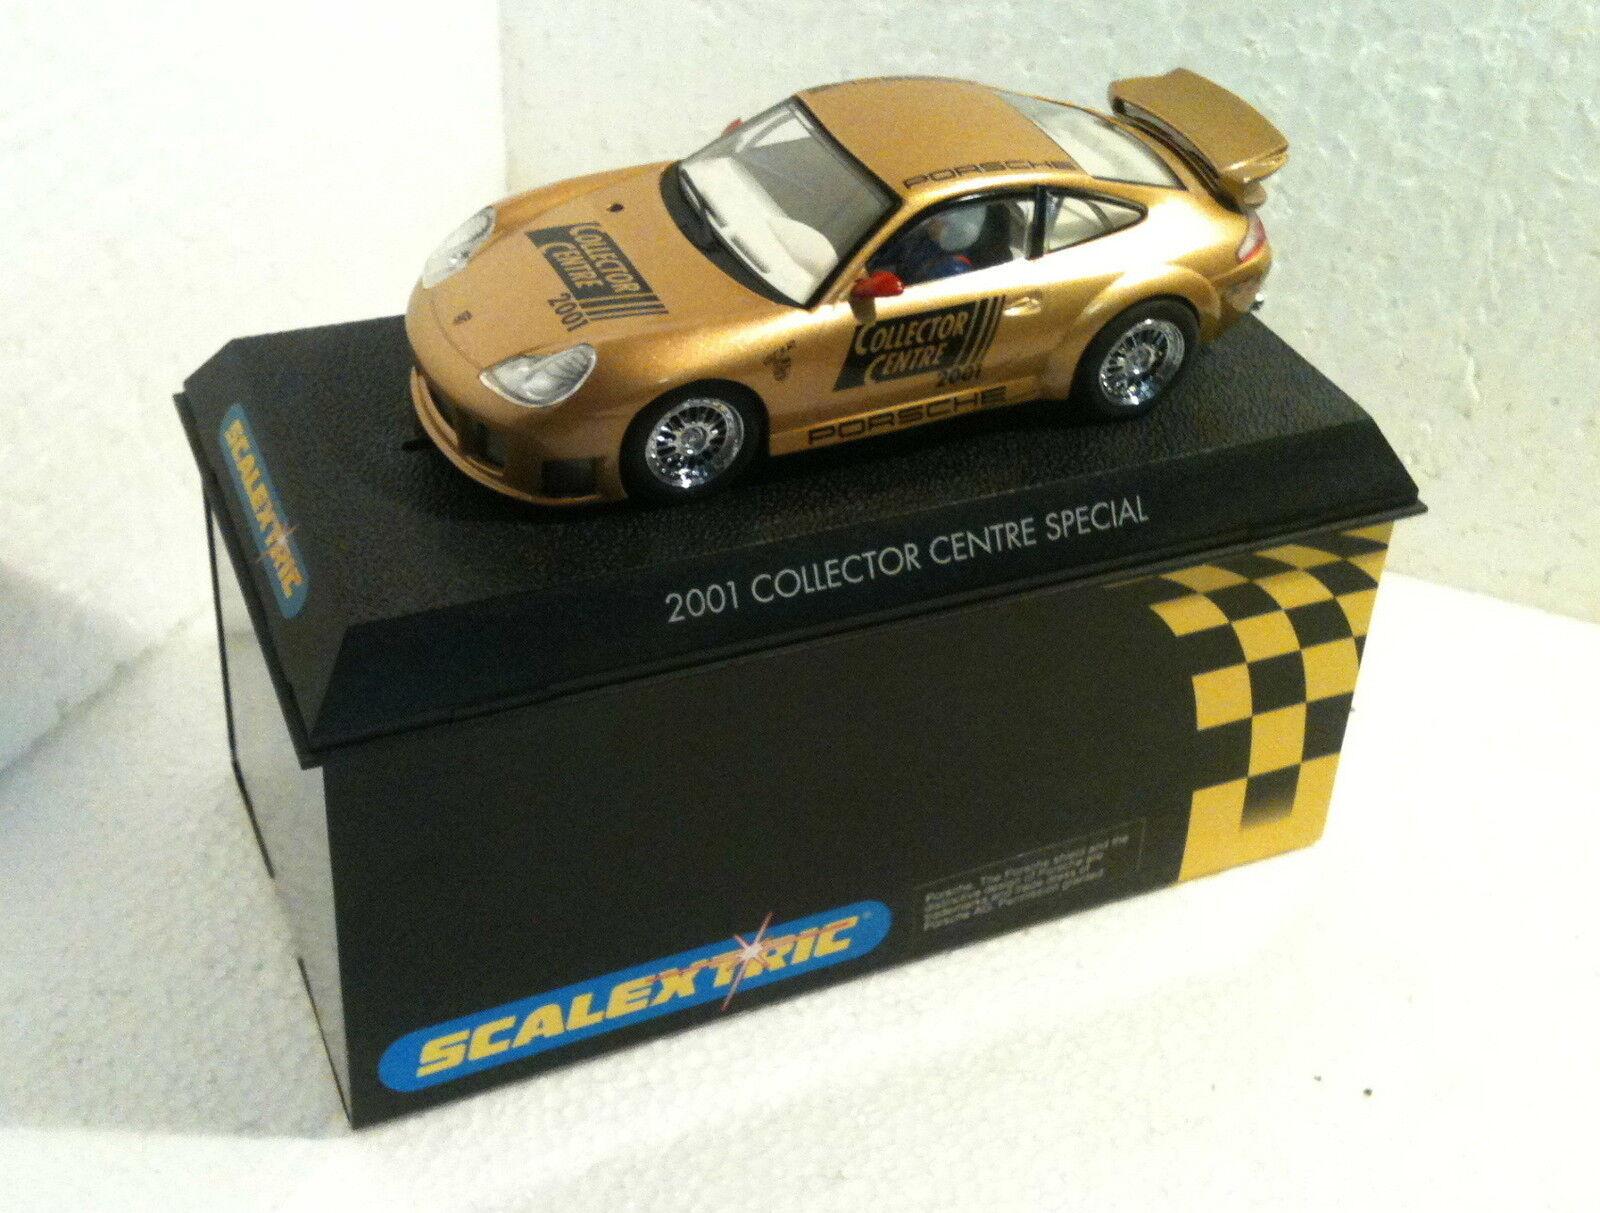 QQ C 2388 Scalextric UK Porsche 911 GT3R 2001 Collector Centre - Scalextric UK